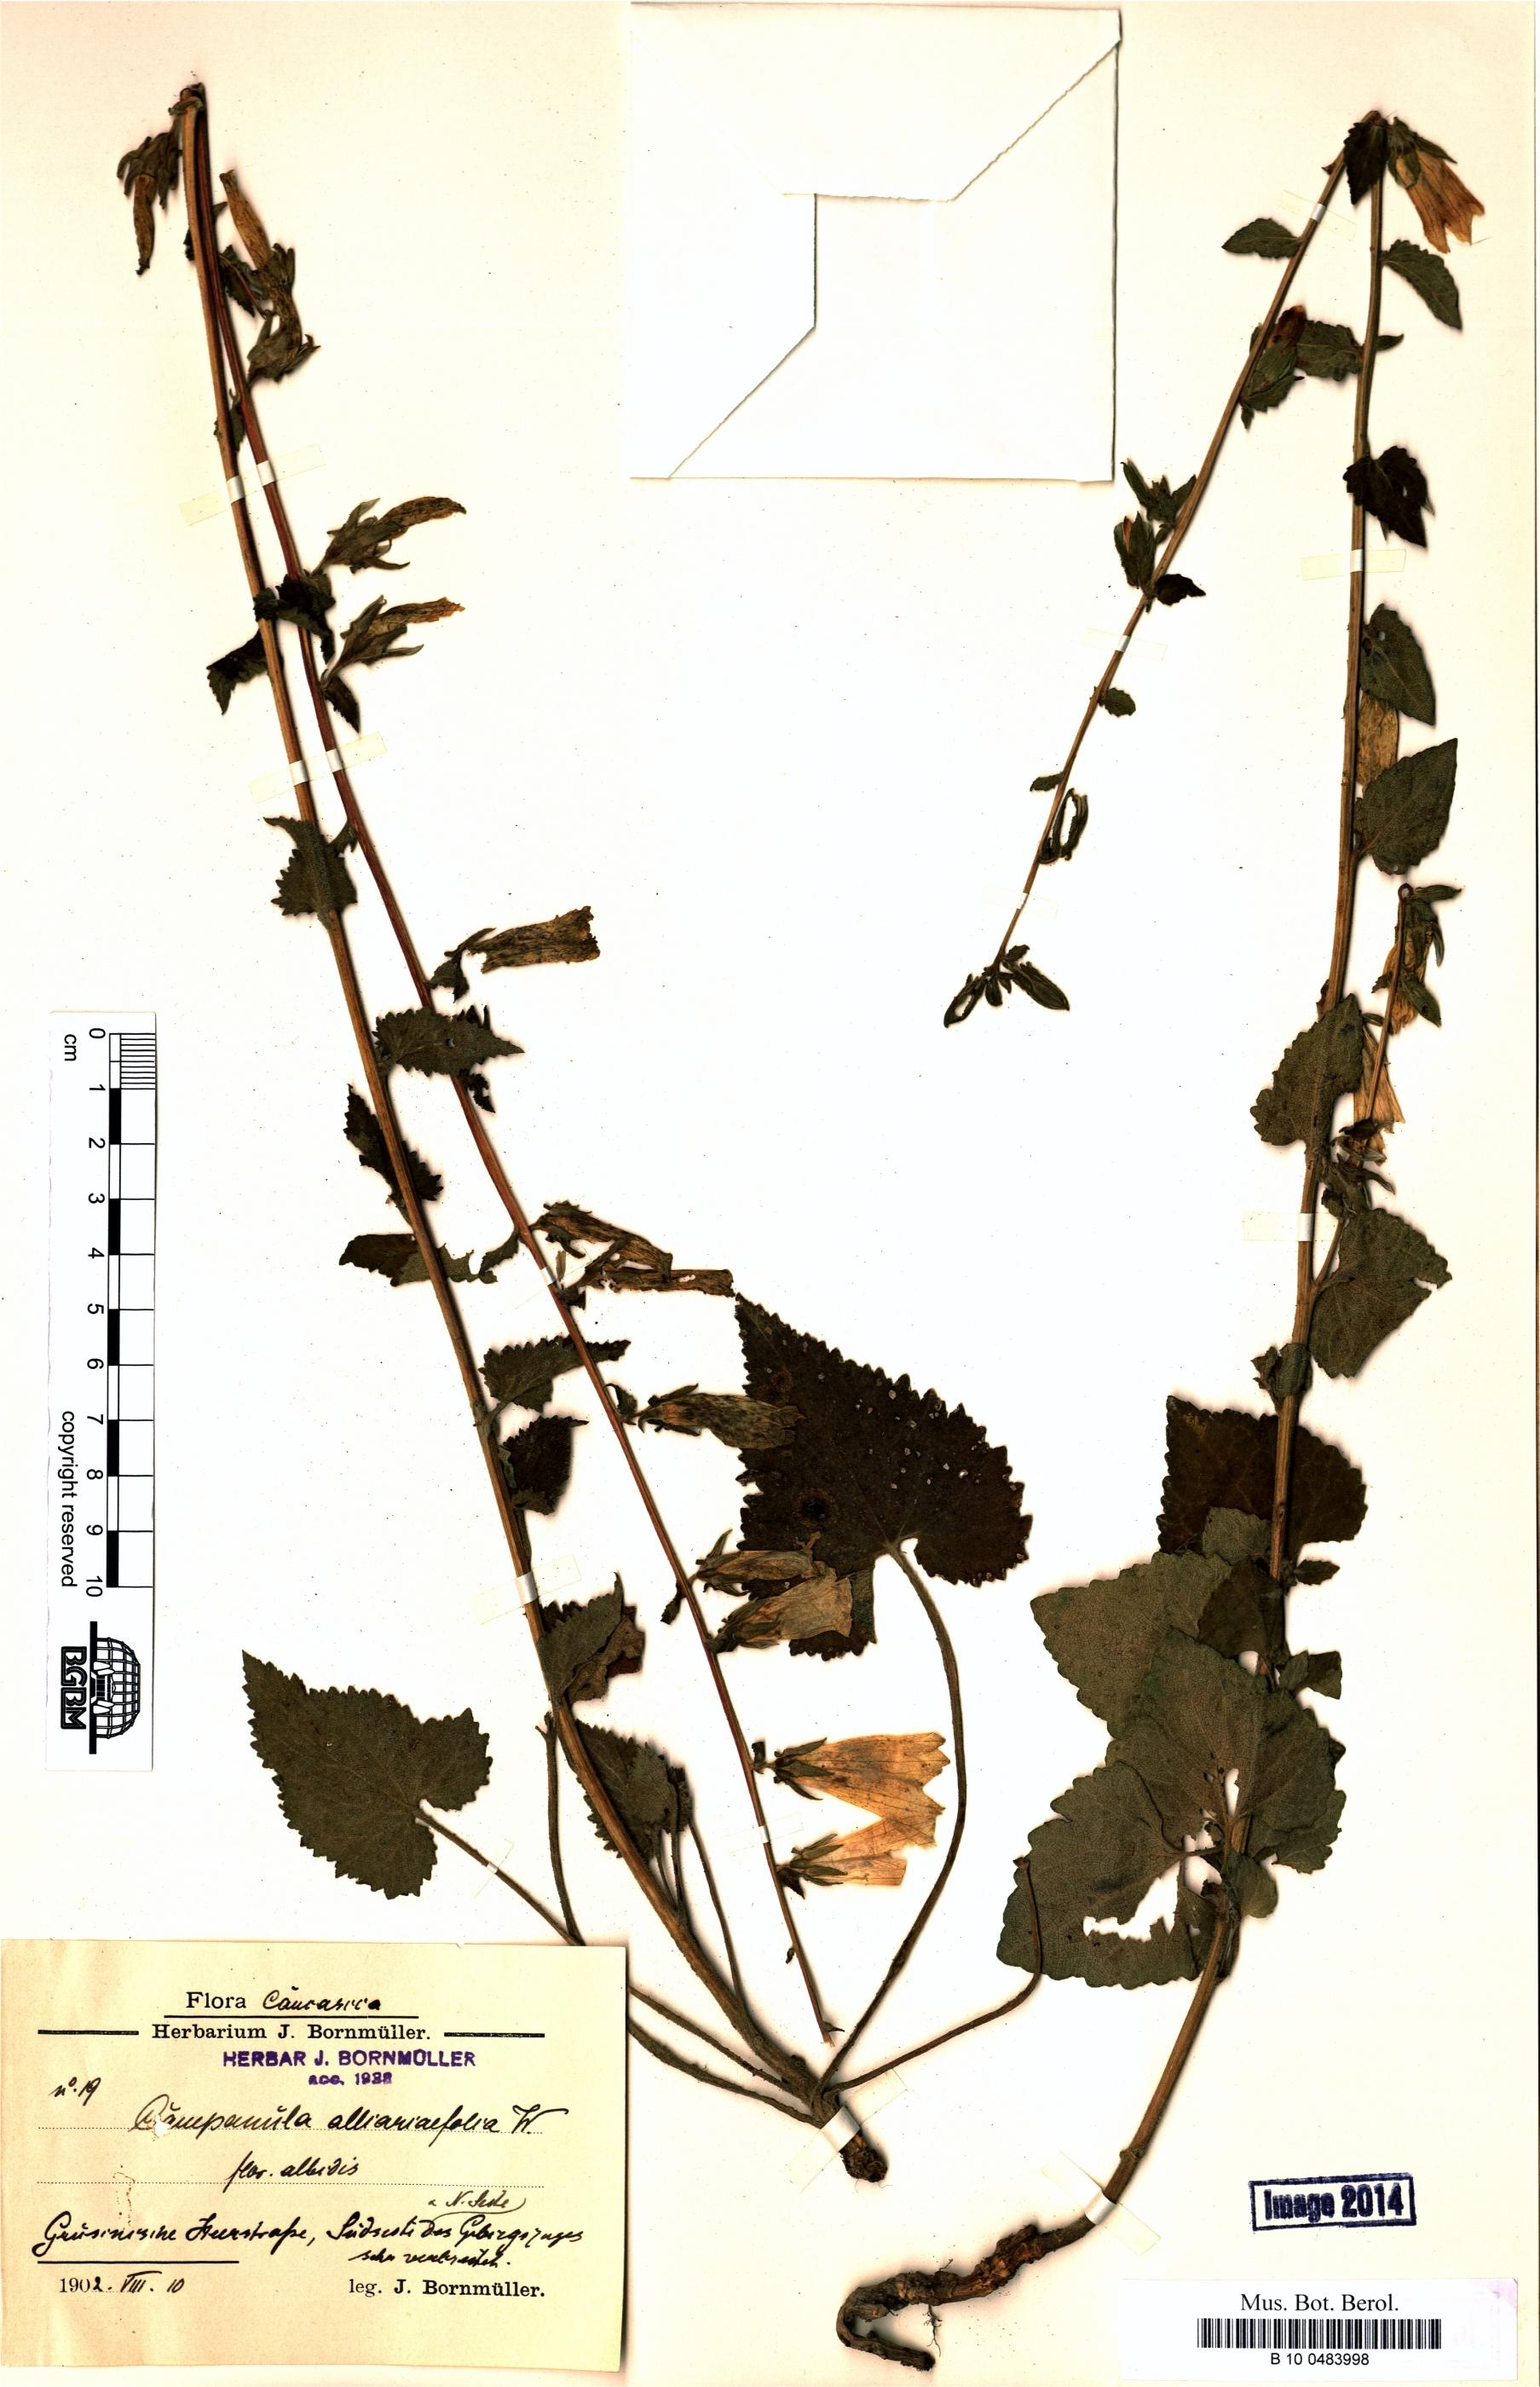 http://ww2.bgbm.org/herbarium/images/B/10/04/83/99/B_10_0483998.jpg